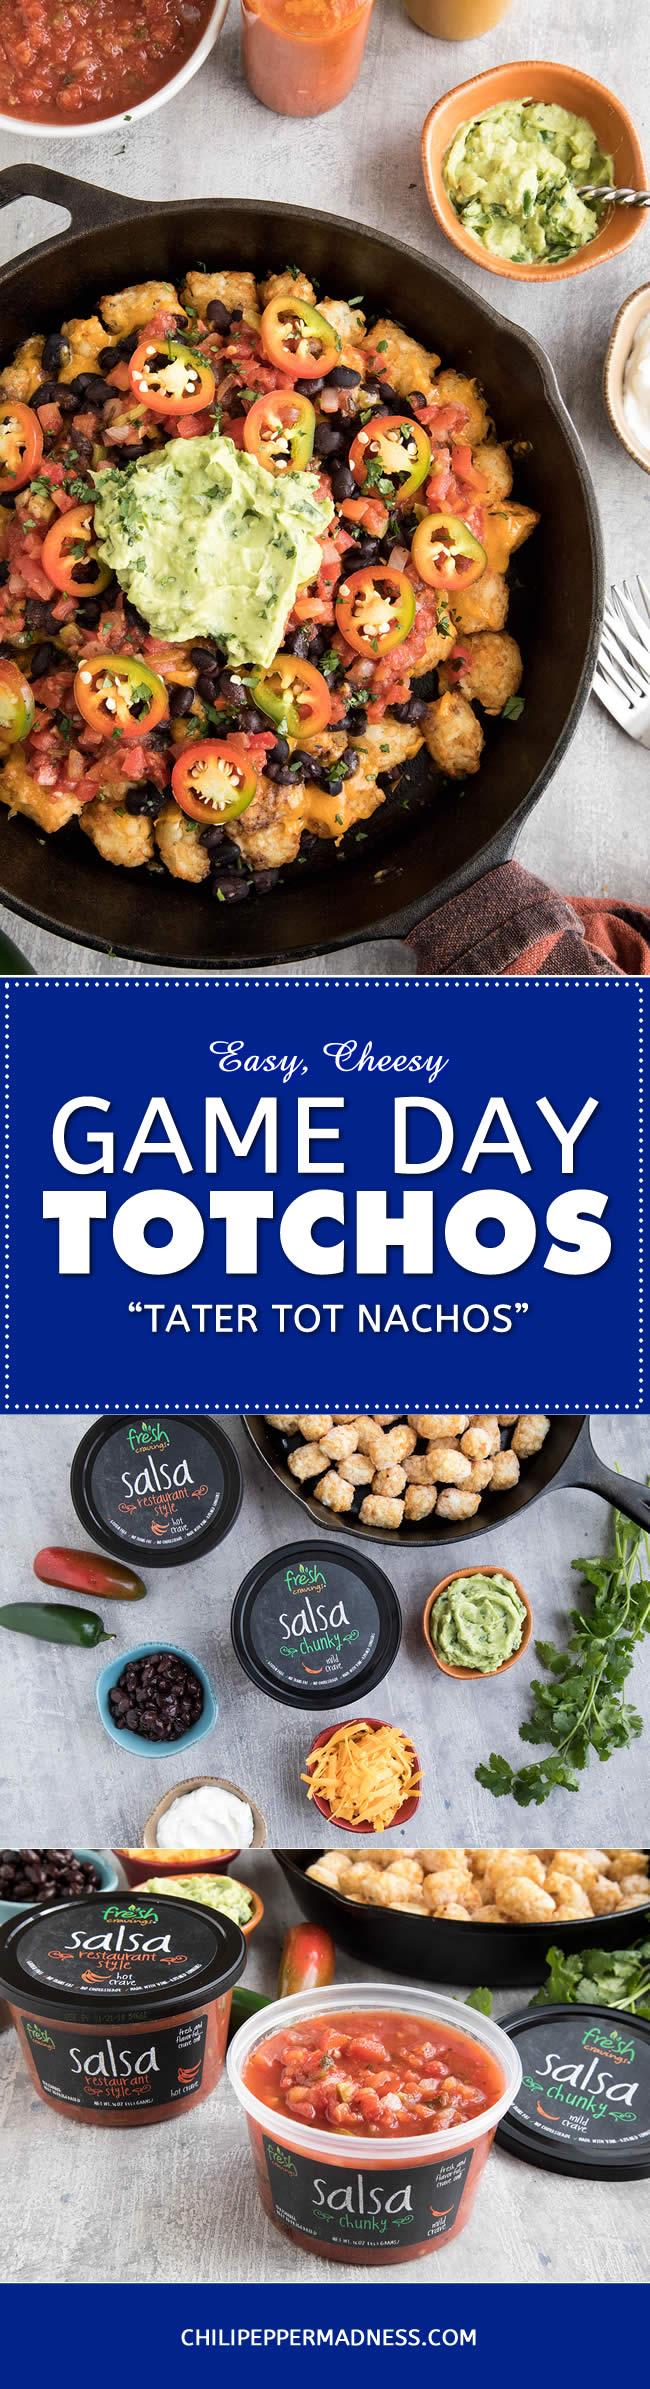 Easy Cheesy Game Day Totchos (Tater Tot Nachos) - Recipe